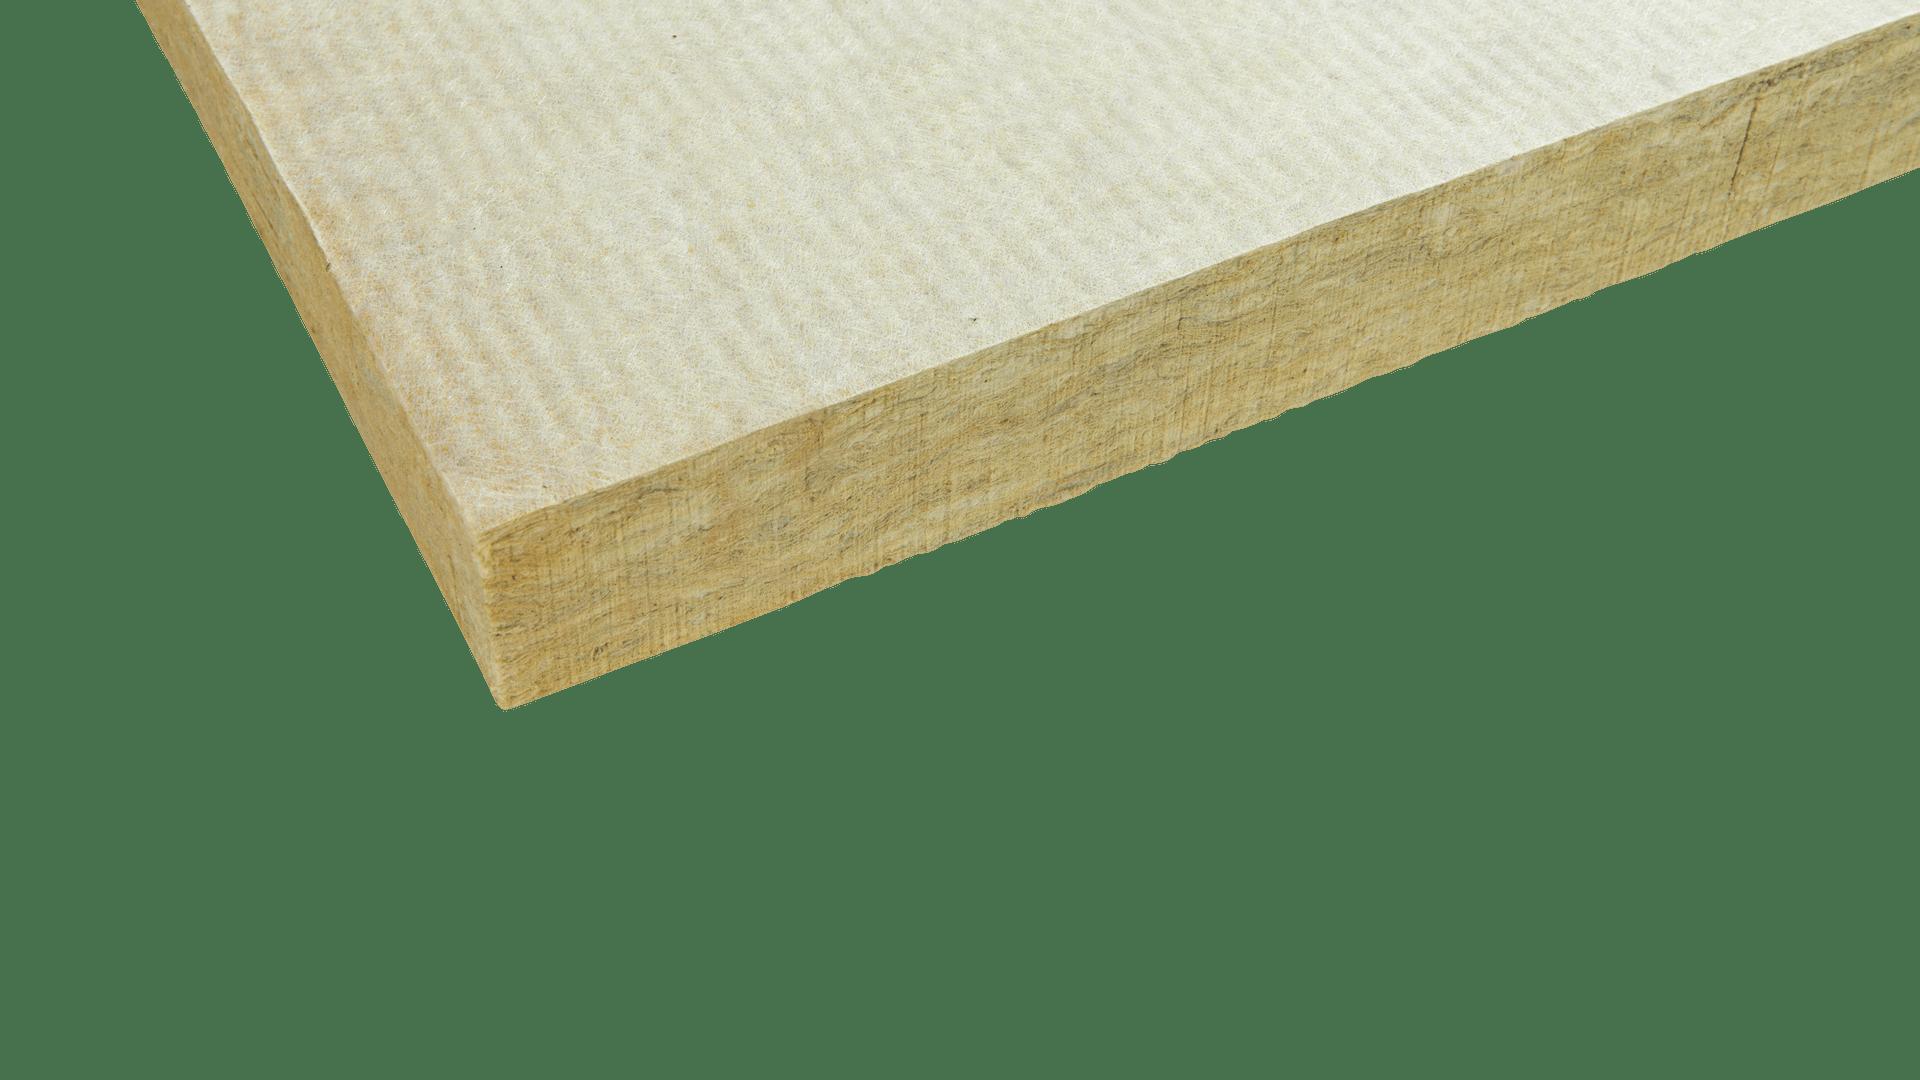 Product pictures, CONLIT 120 (Med hvid vlies), (med vit väv)